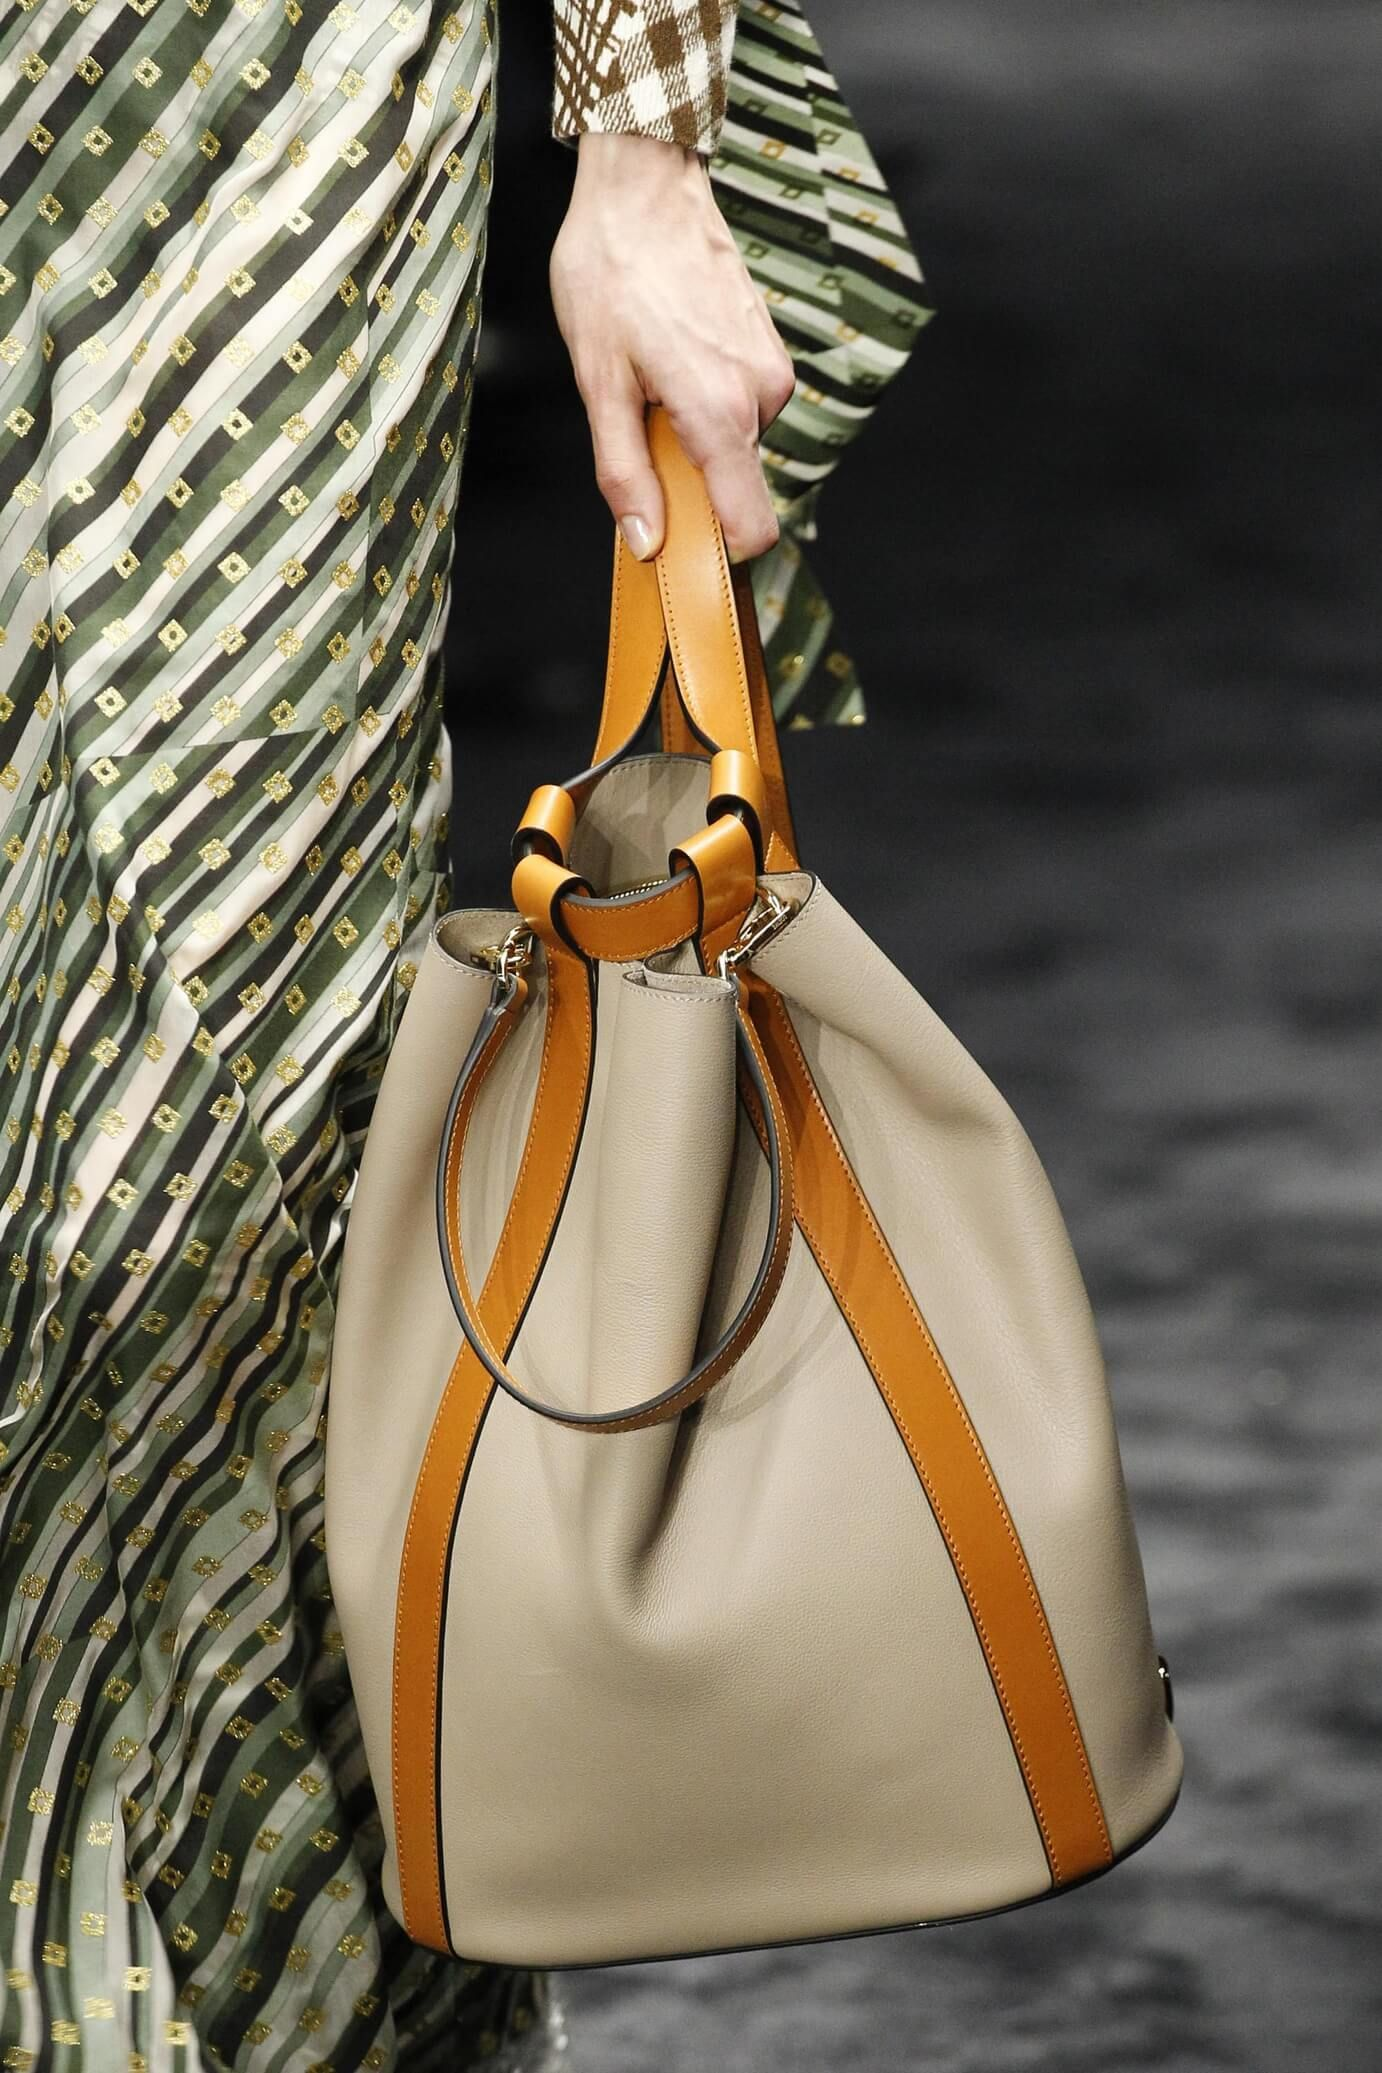 Top 15 bolsos de moda para esta temporada de primavera | Fashionterest